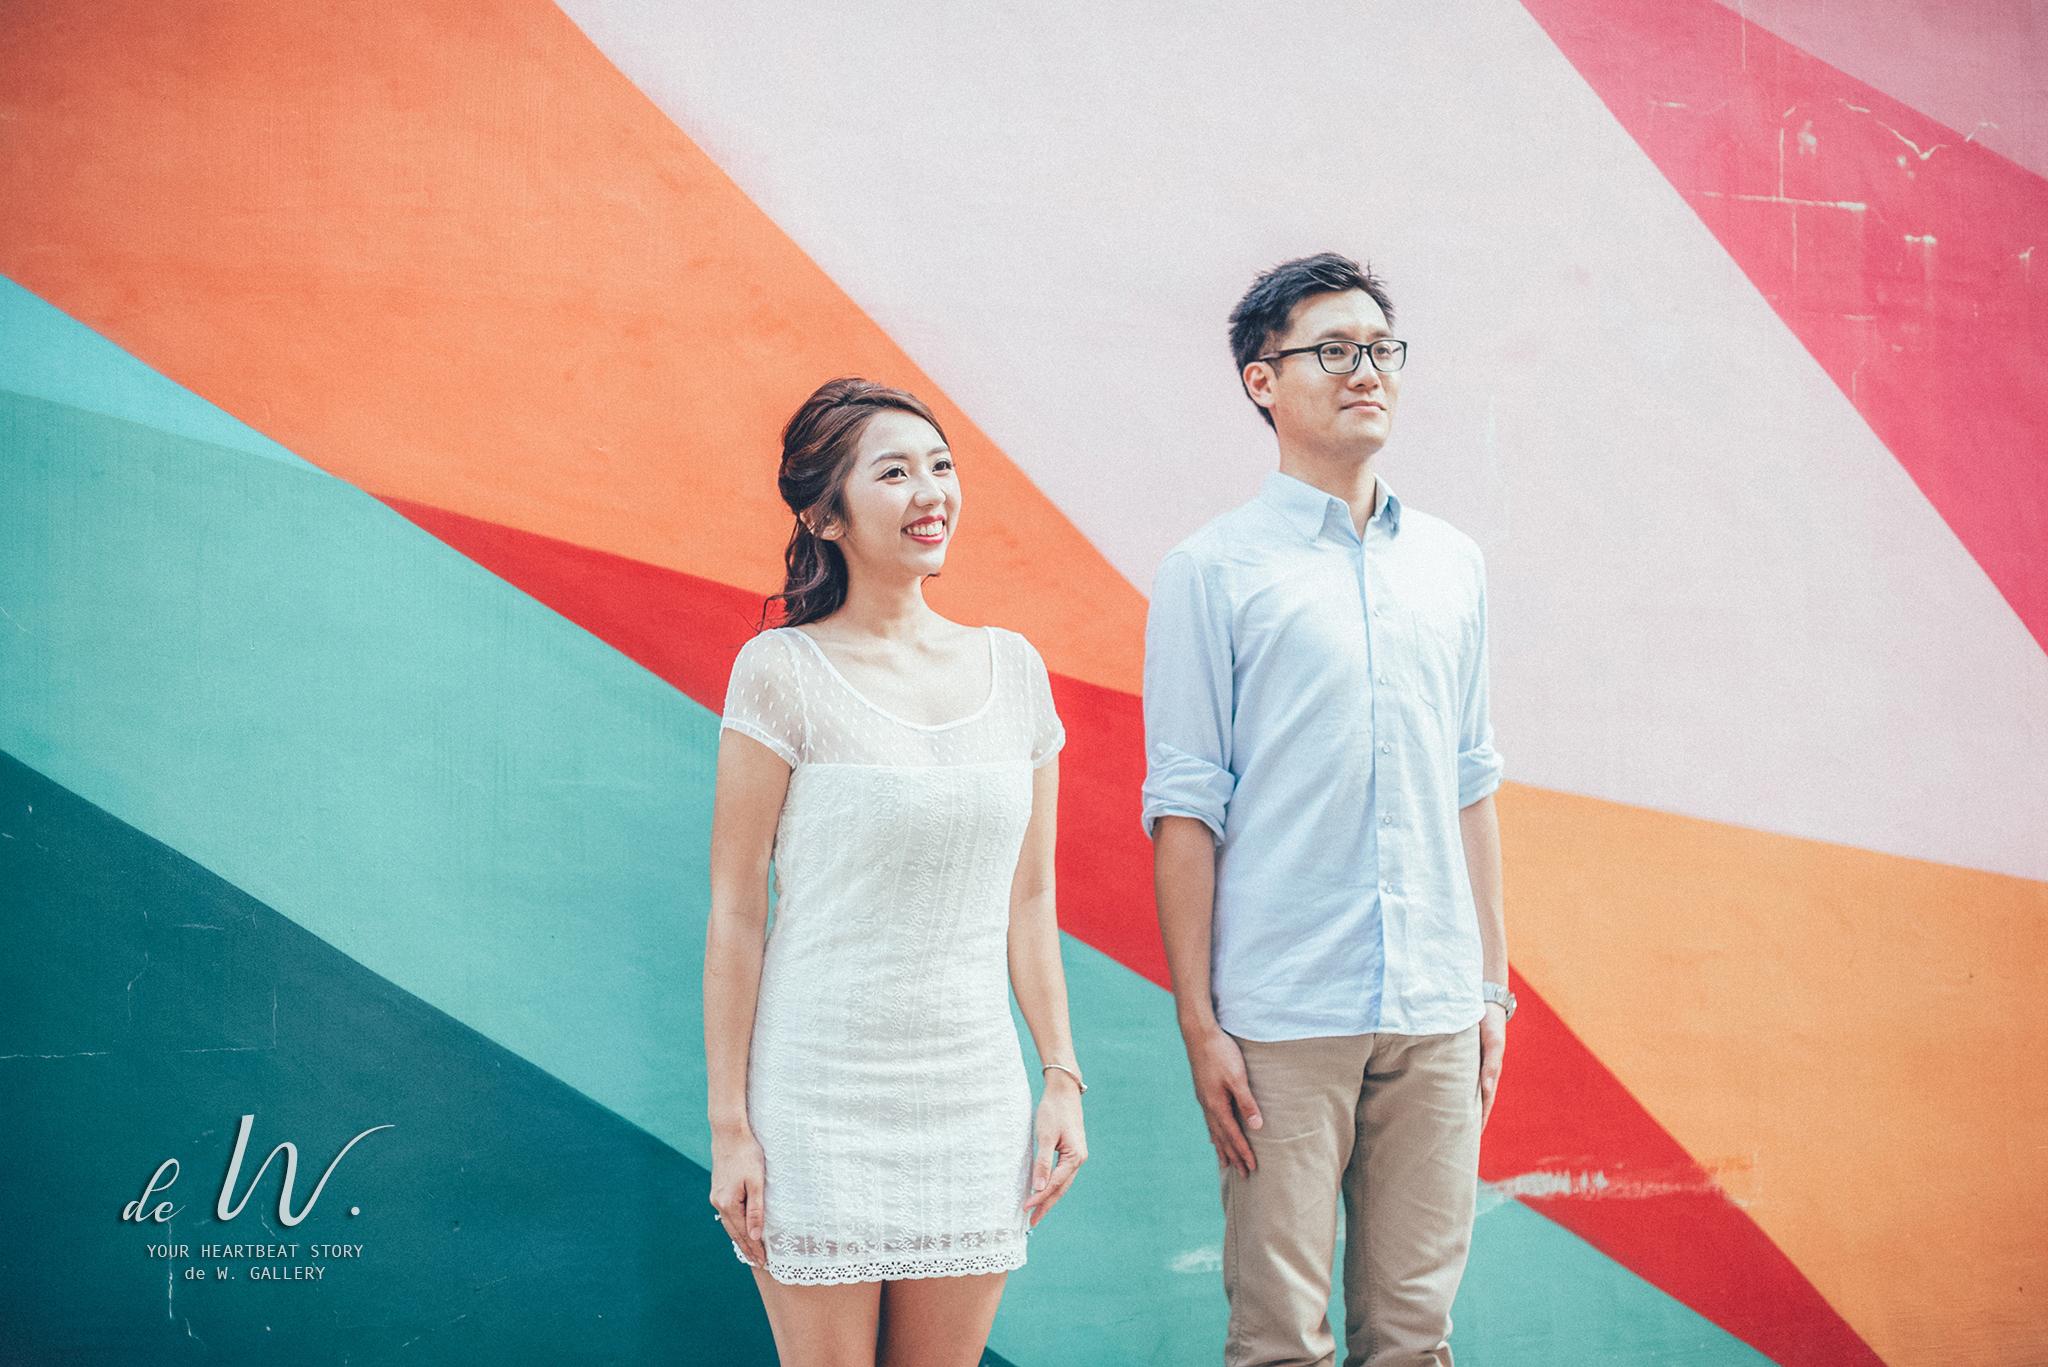 2048 de w gallery Film style hong kong 底片 拍拖 engagement vsco 故事 中環 西環 central-15